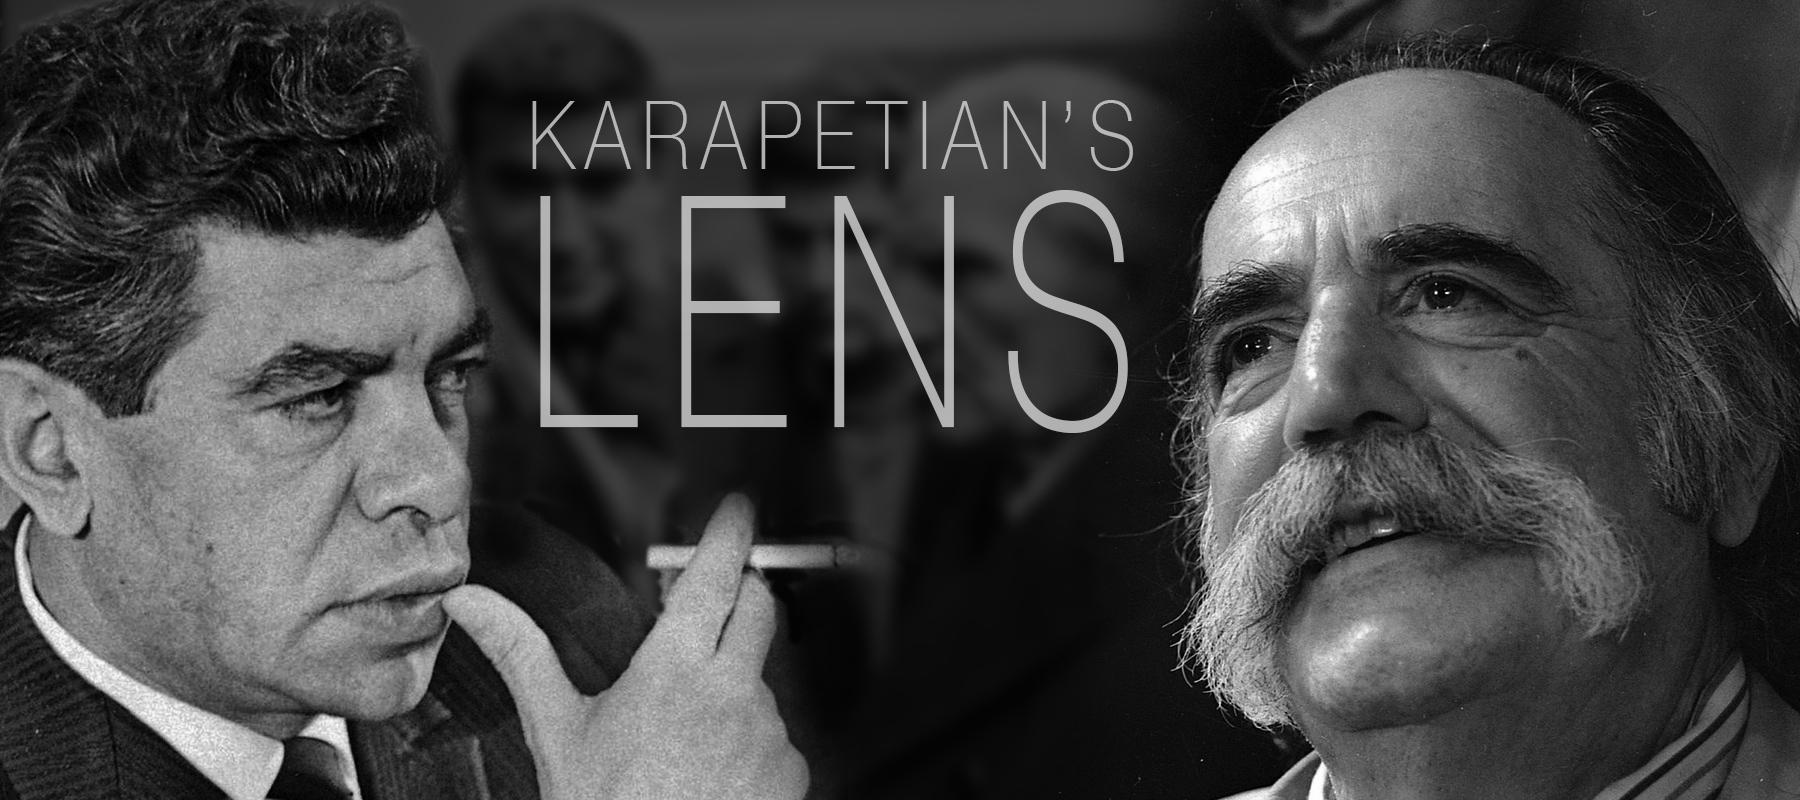 Karapetian's Photography